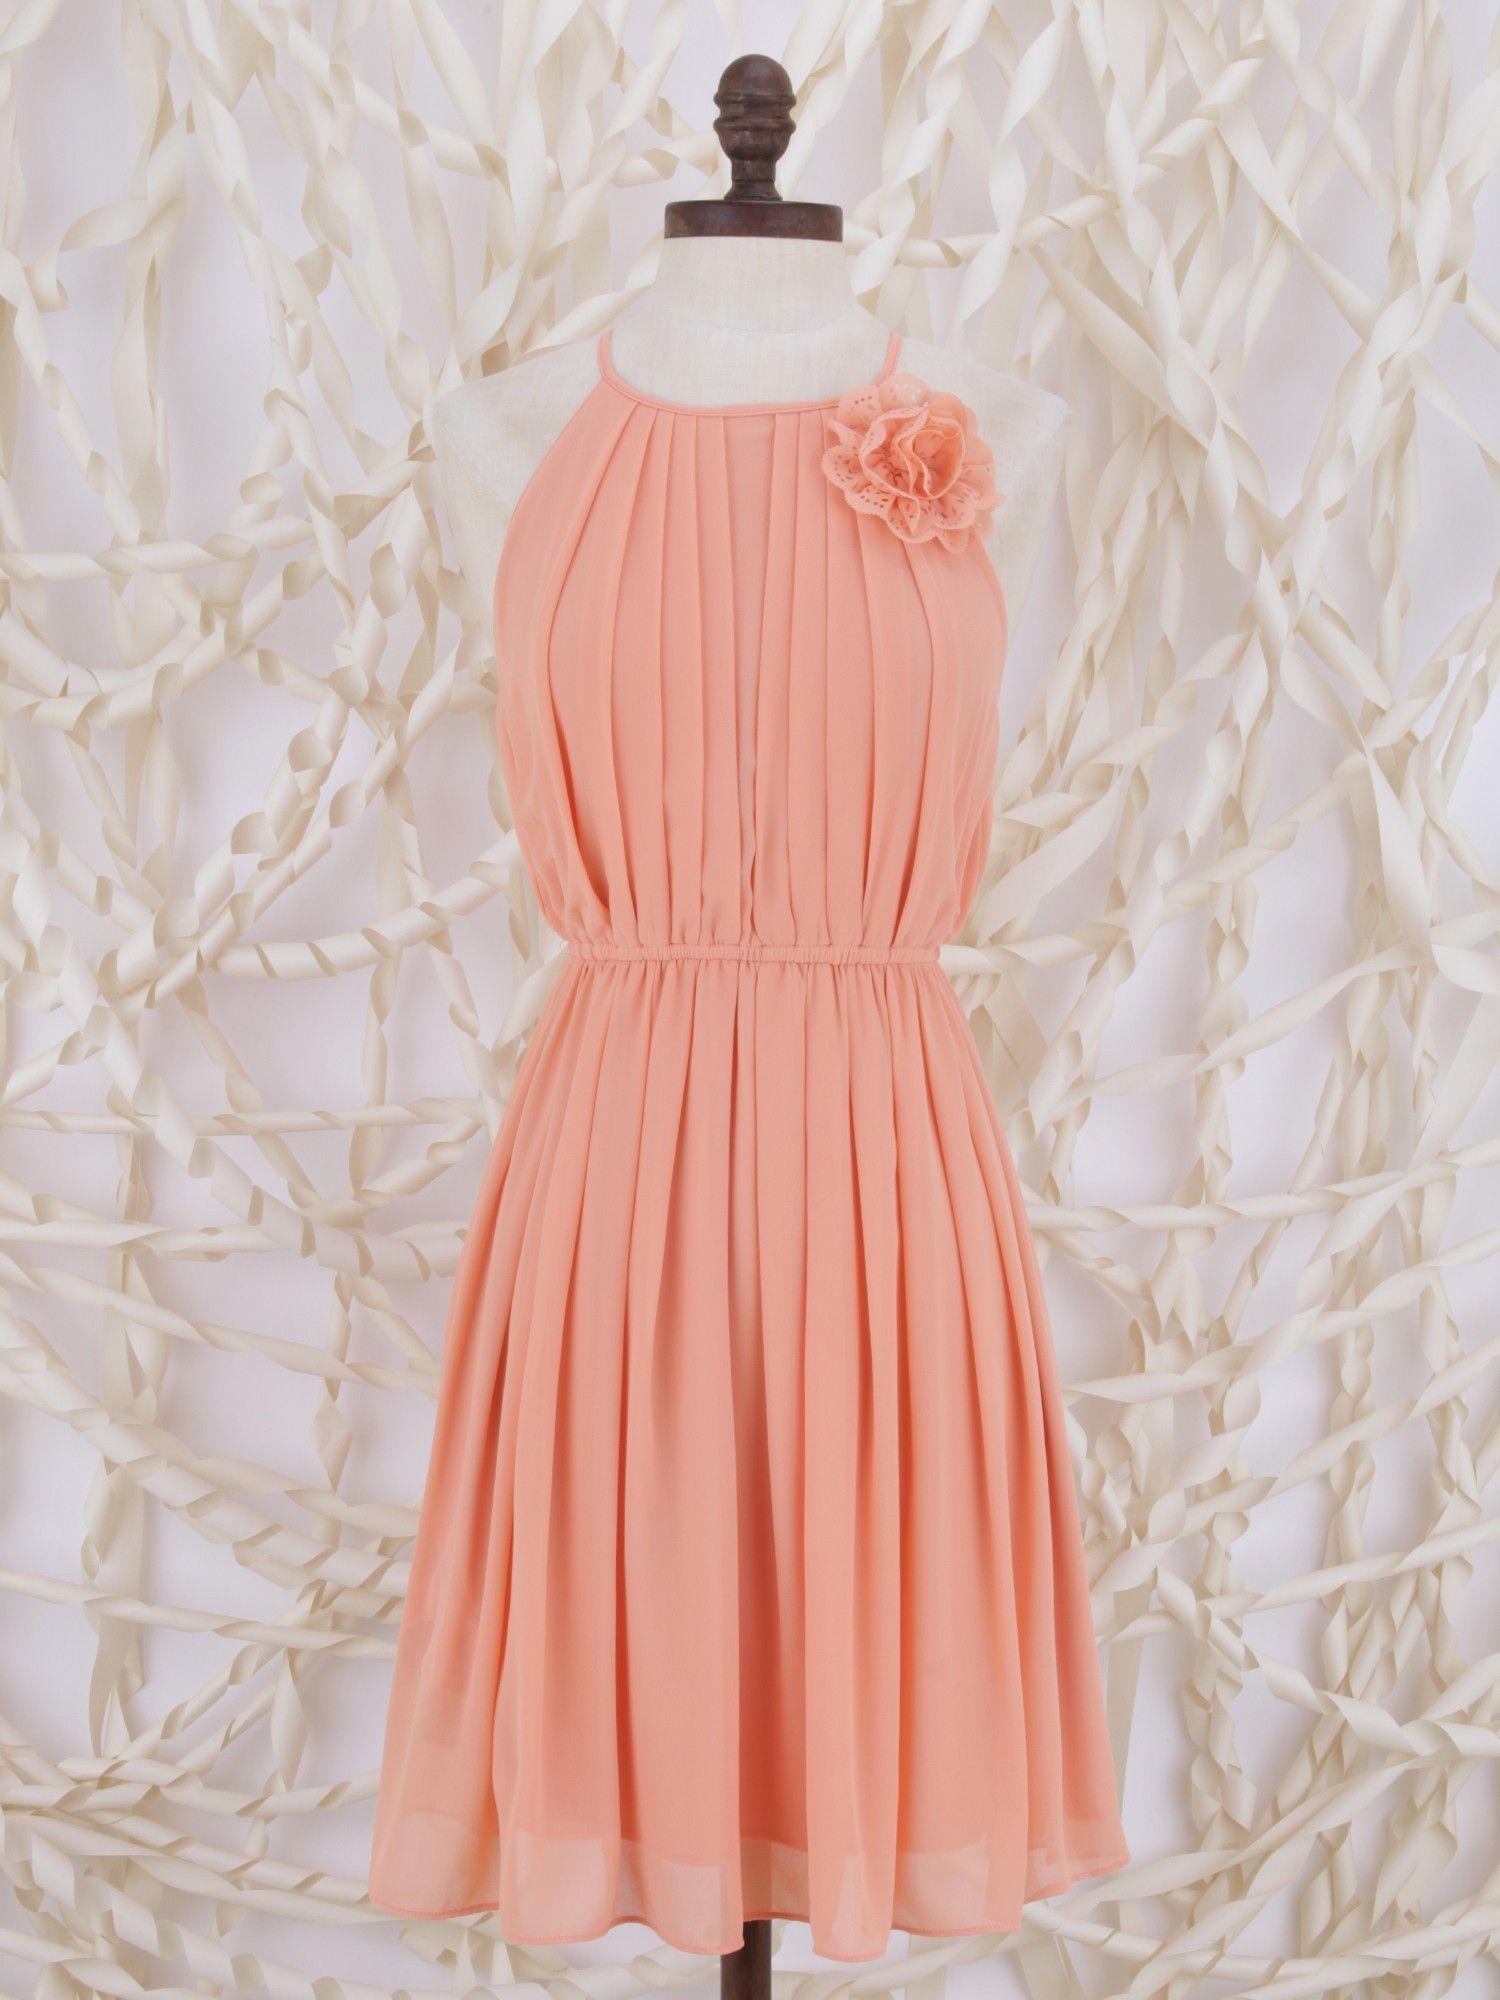 7e2cbcf48 Altar d State Flower Pin Dress - Dresses - Apparel